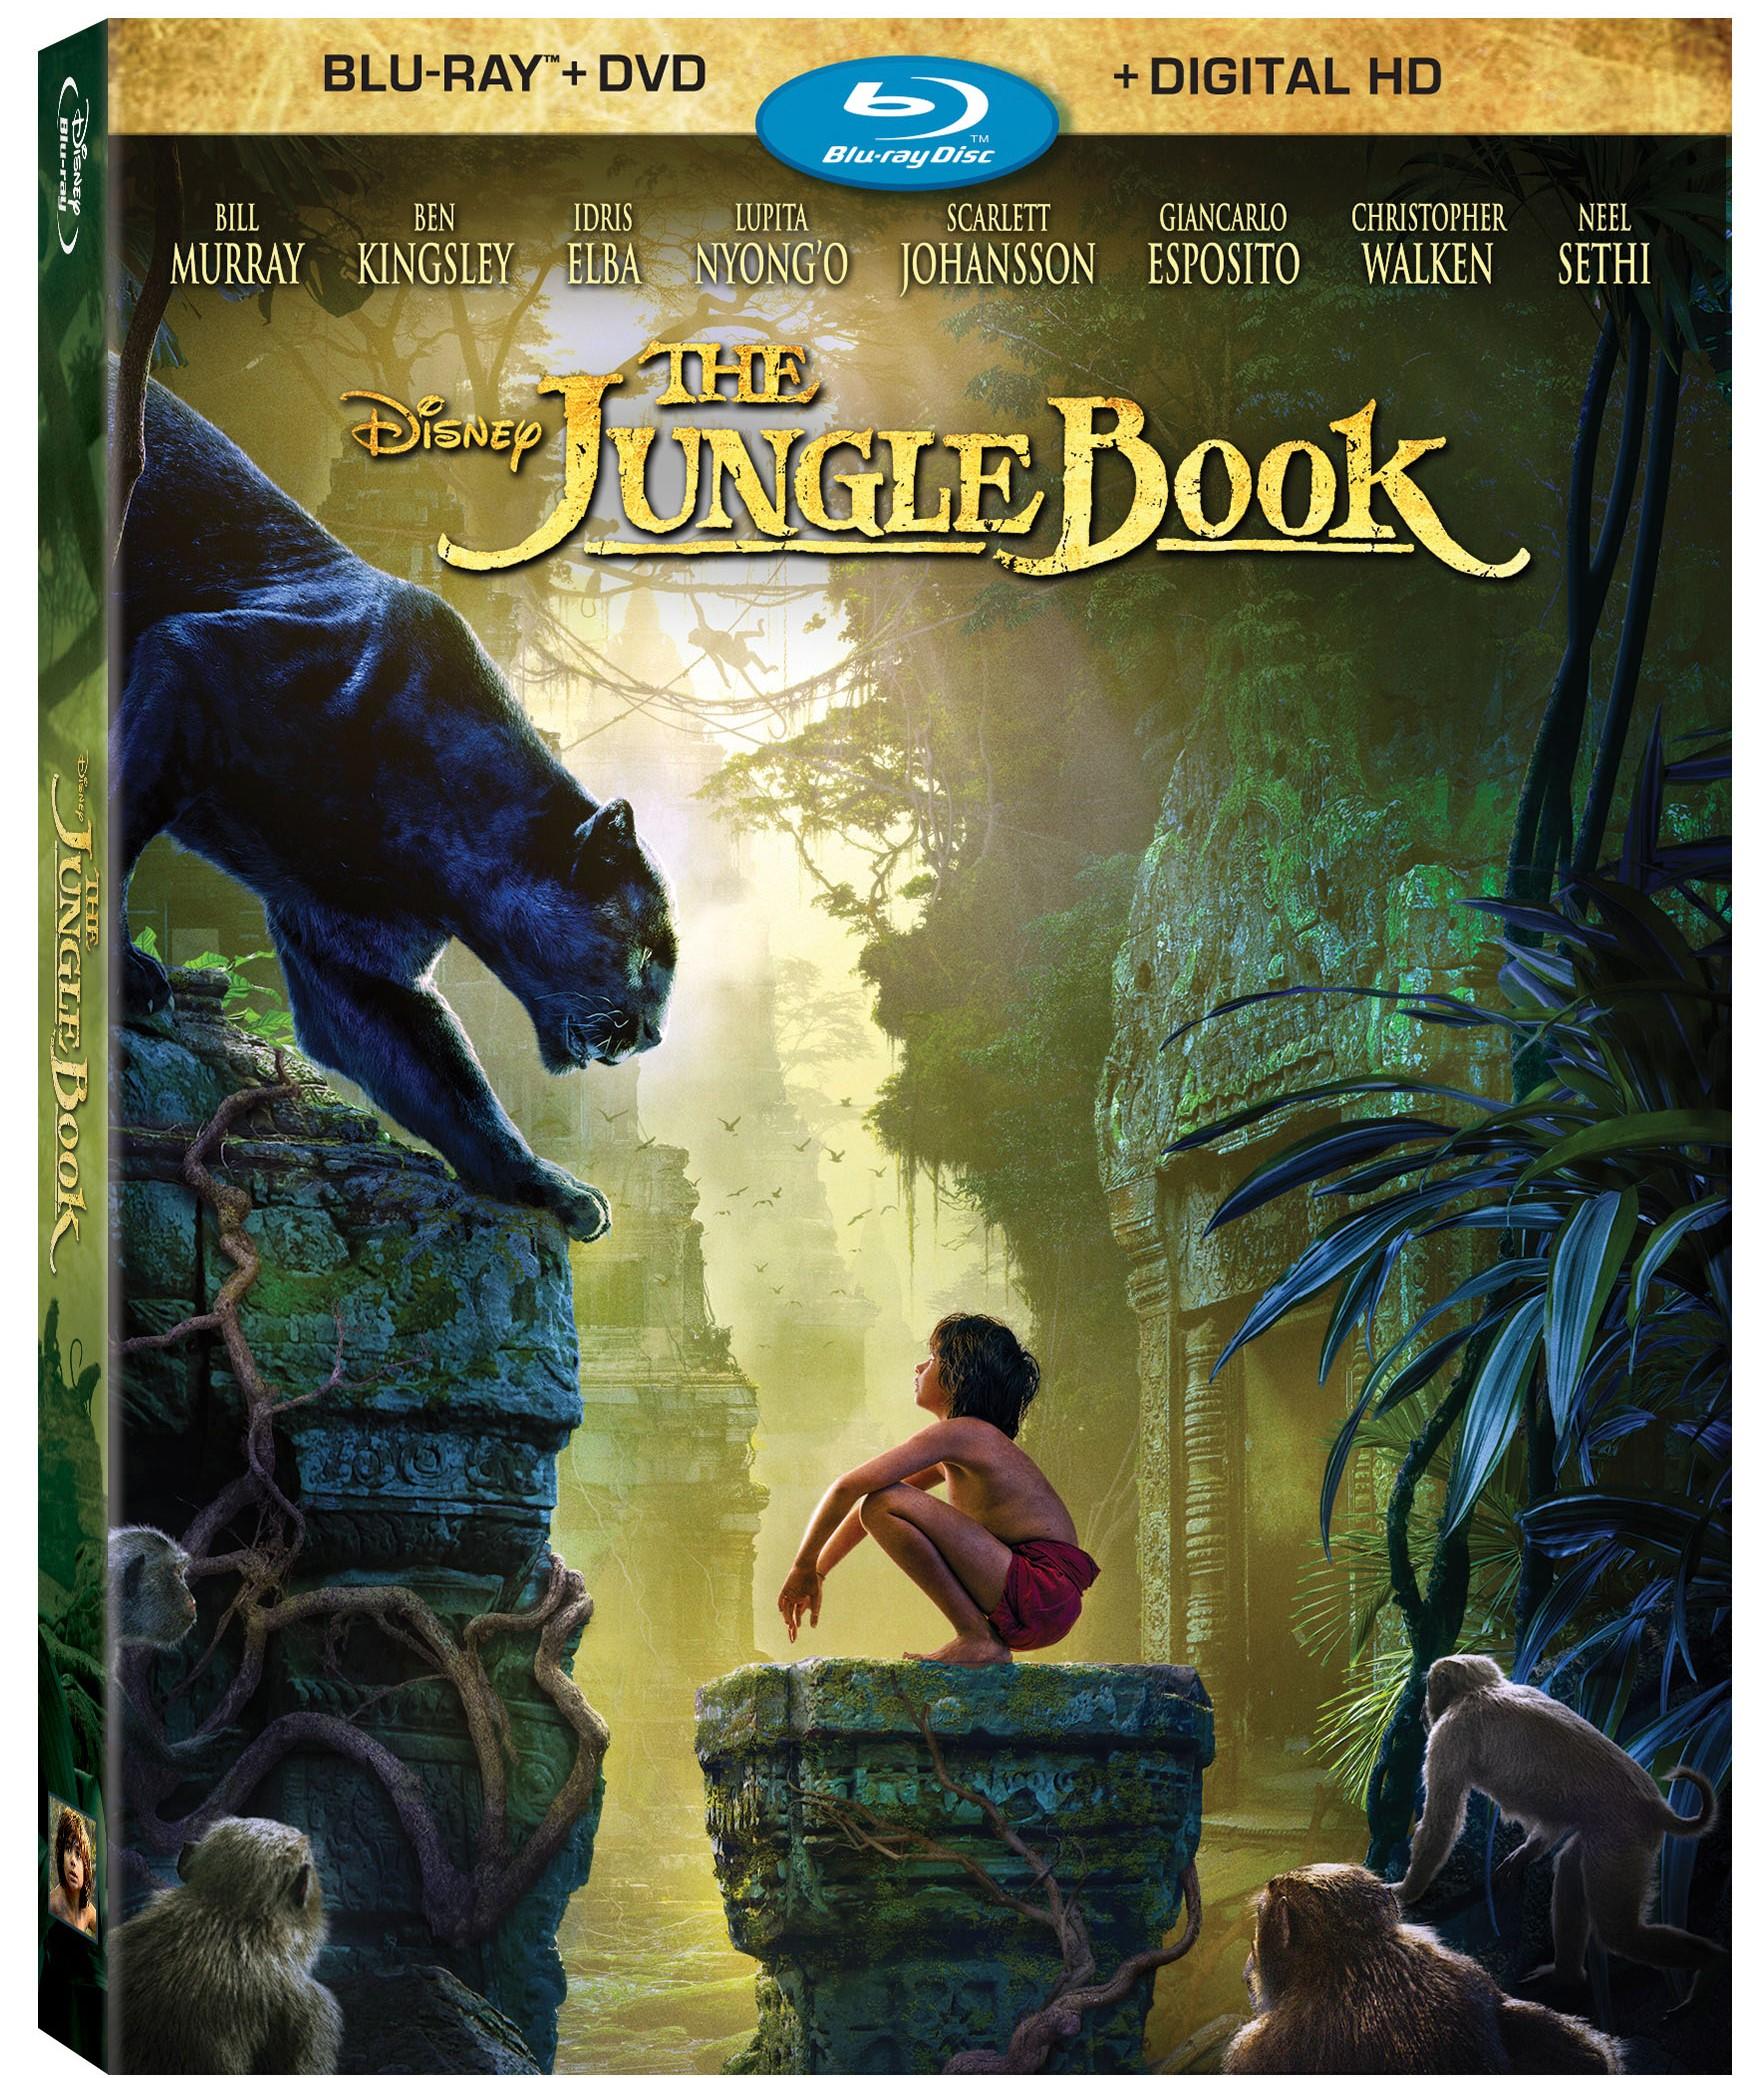 The Jungle Book Blu-ray